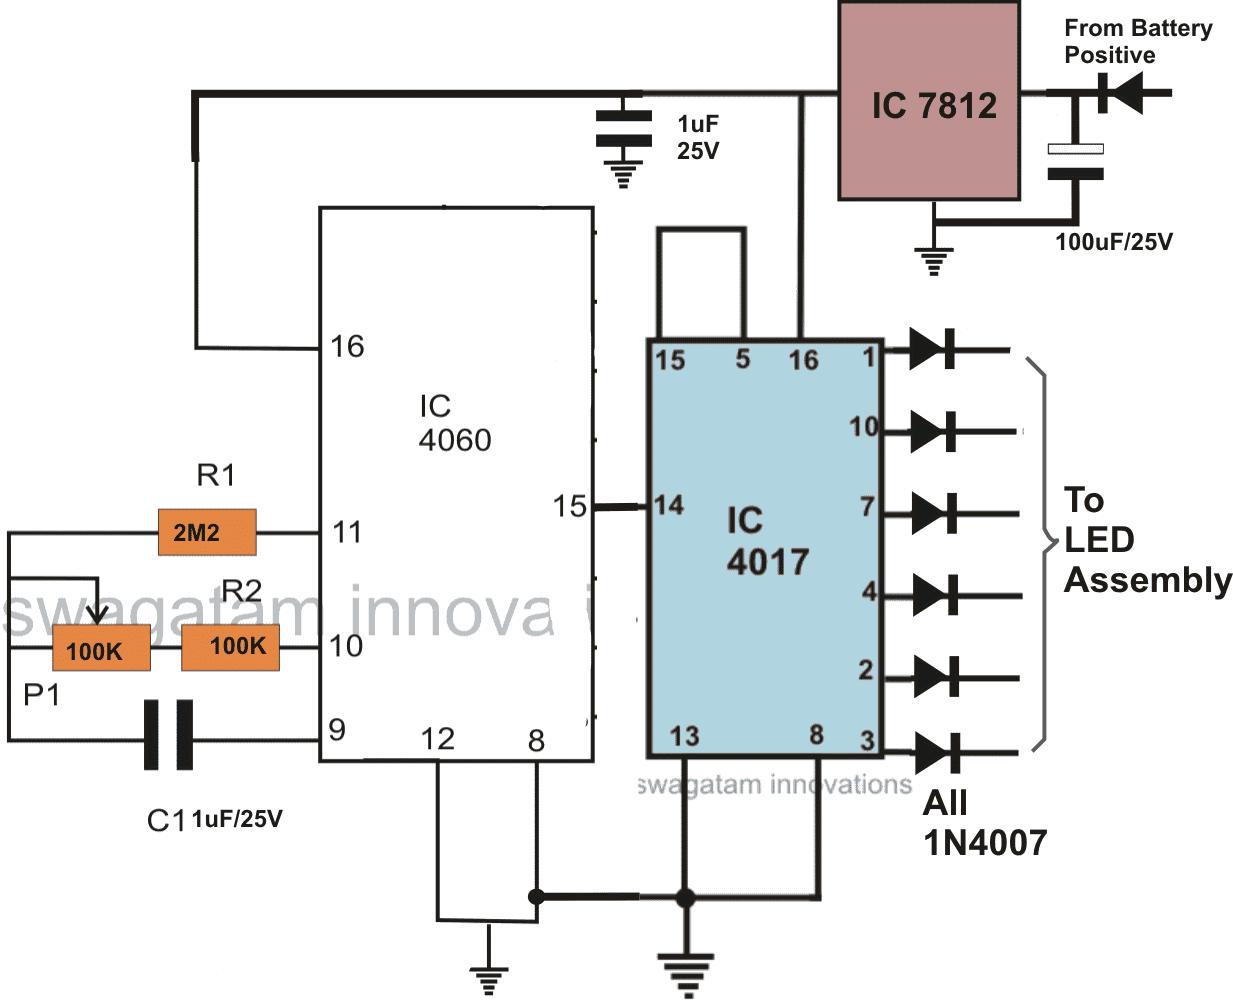 hight resolution of ic 4060 ic 4017 led bar graph brake light